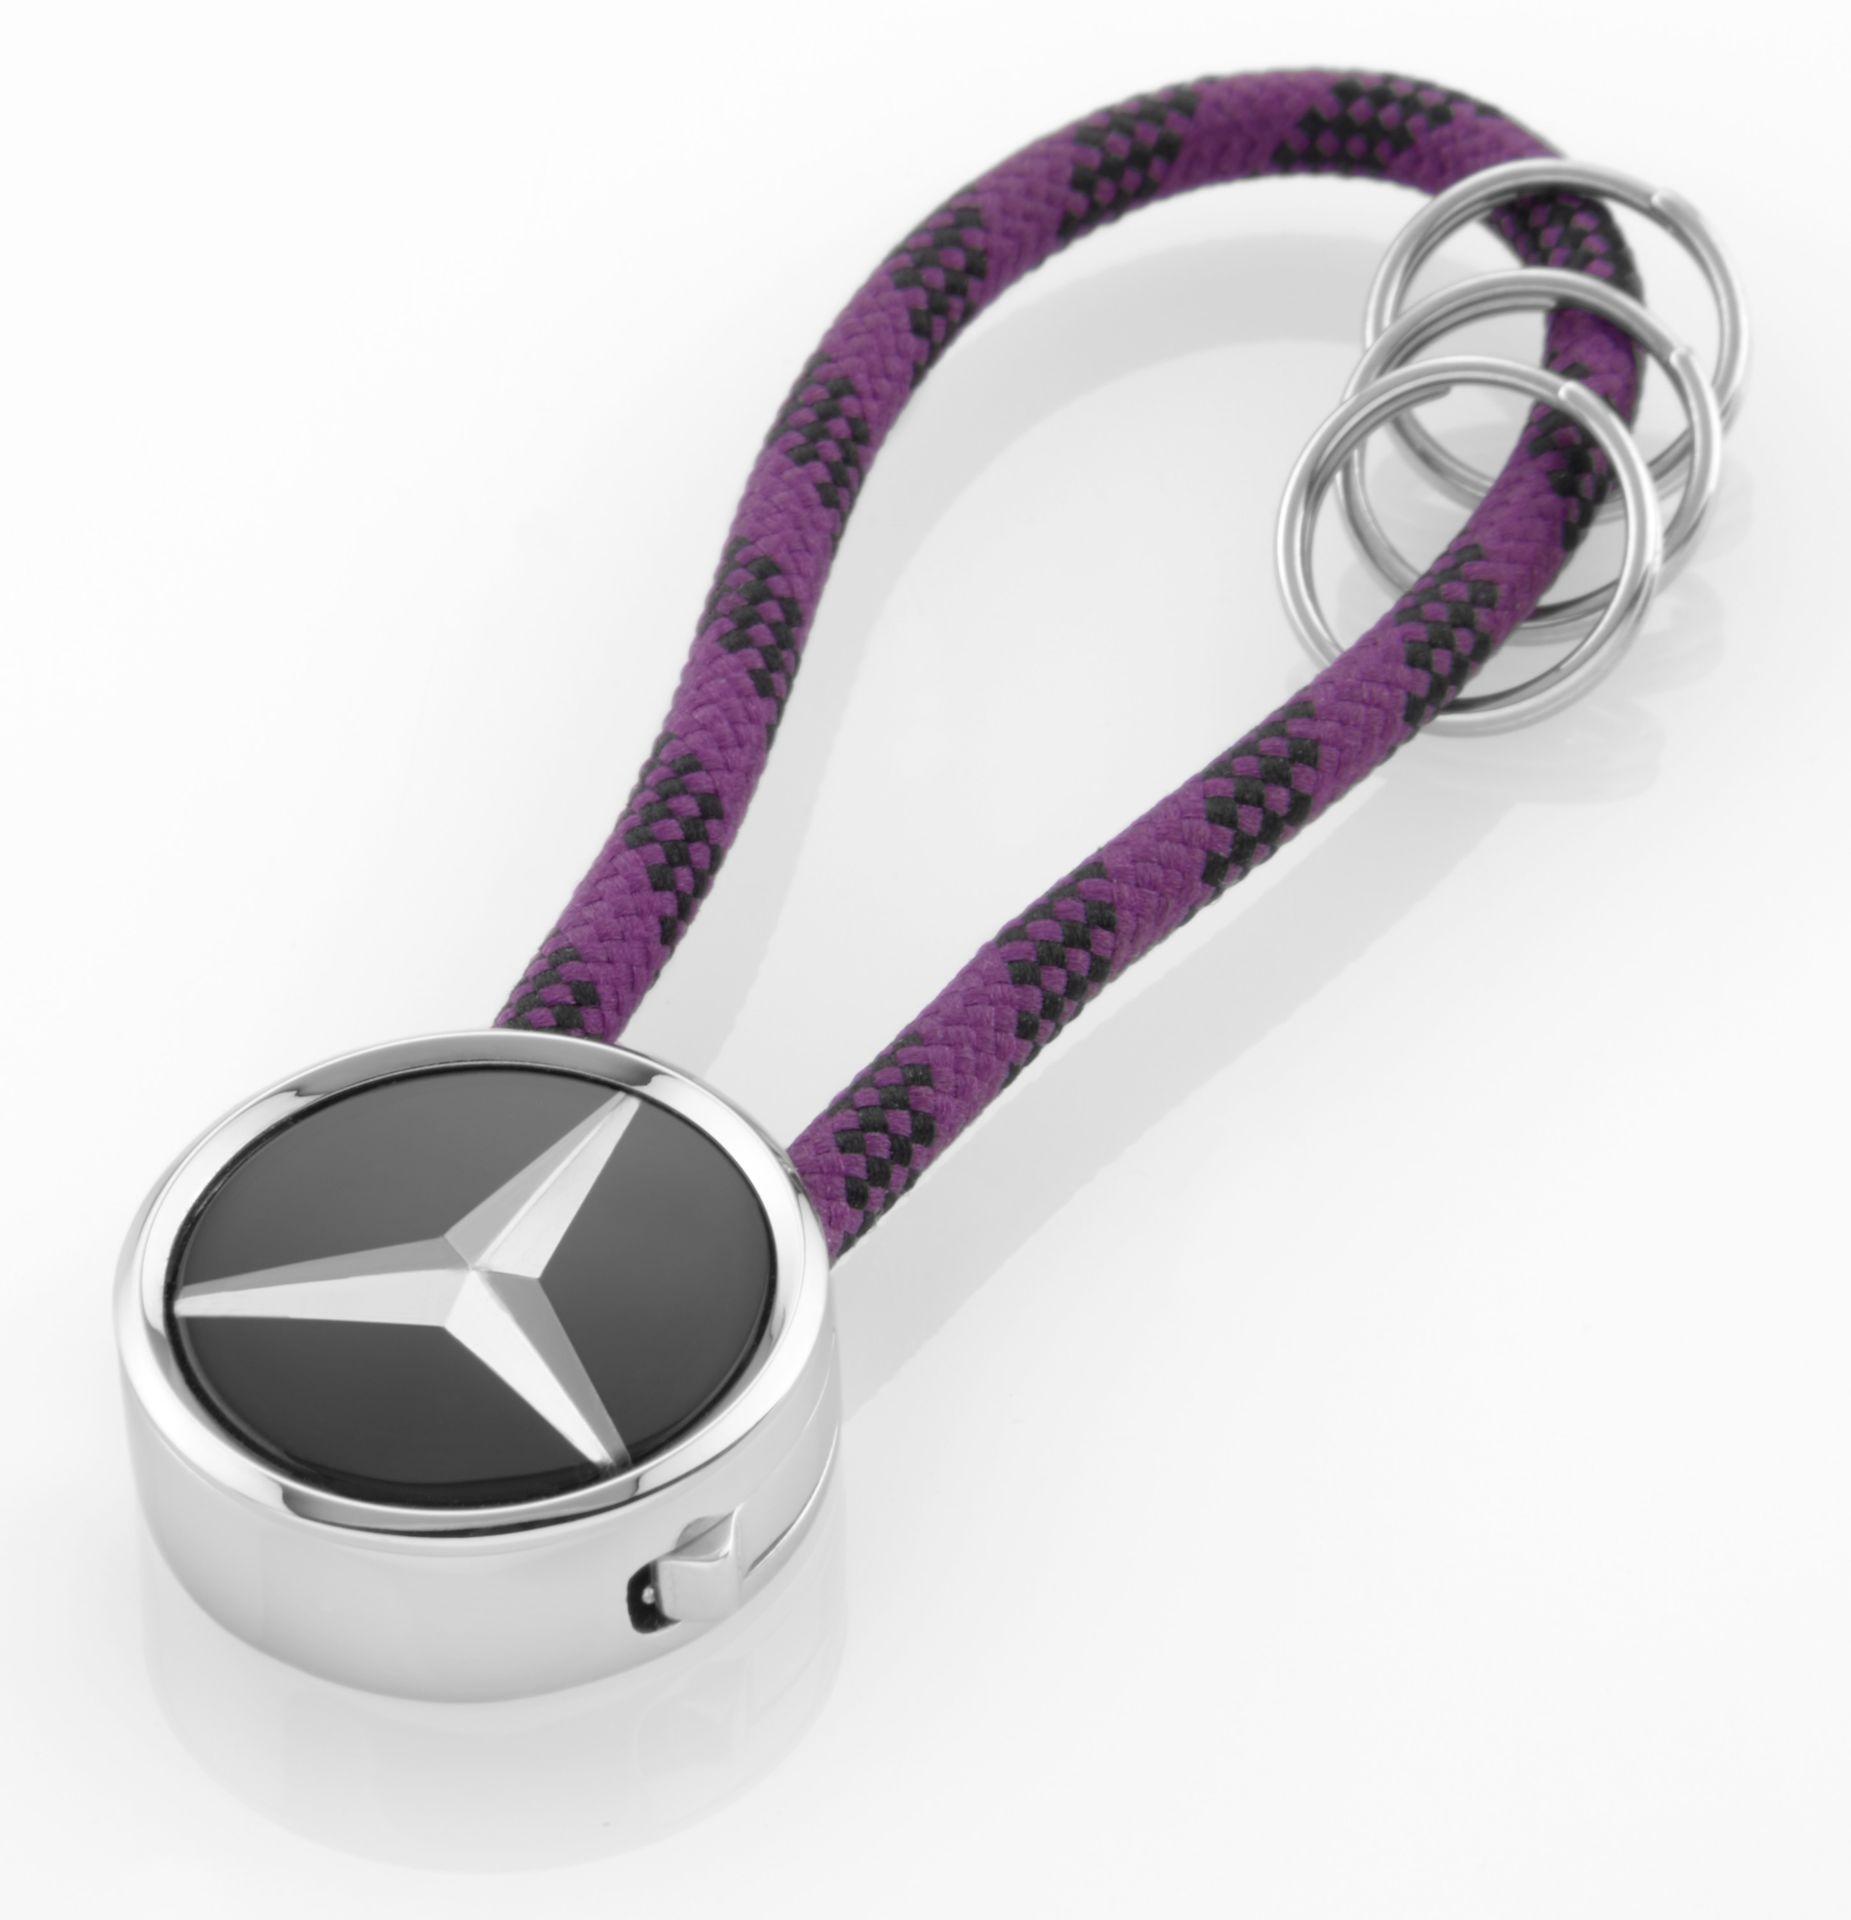 Брелок Mercedes-Benz Key Ring, Mumbai, Black/Silver/Plum